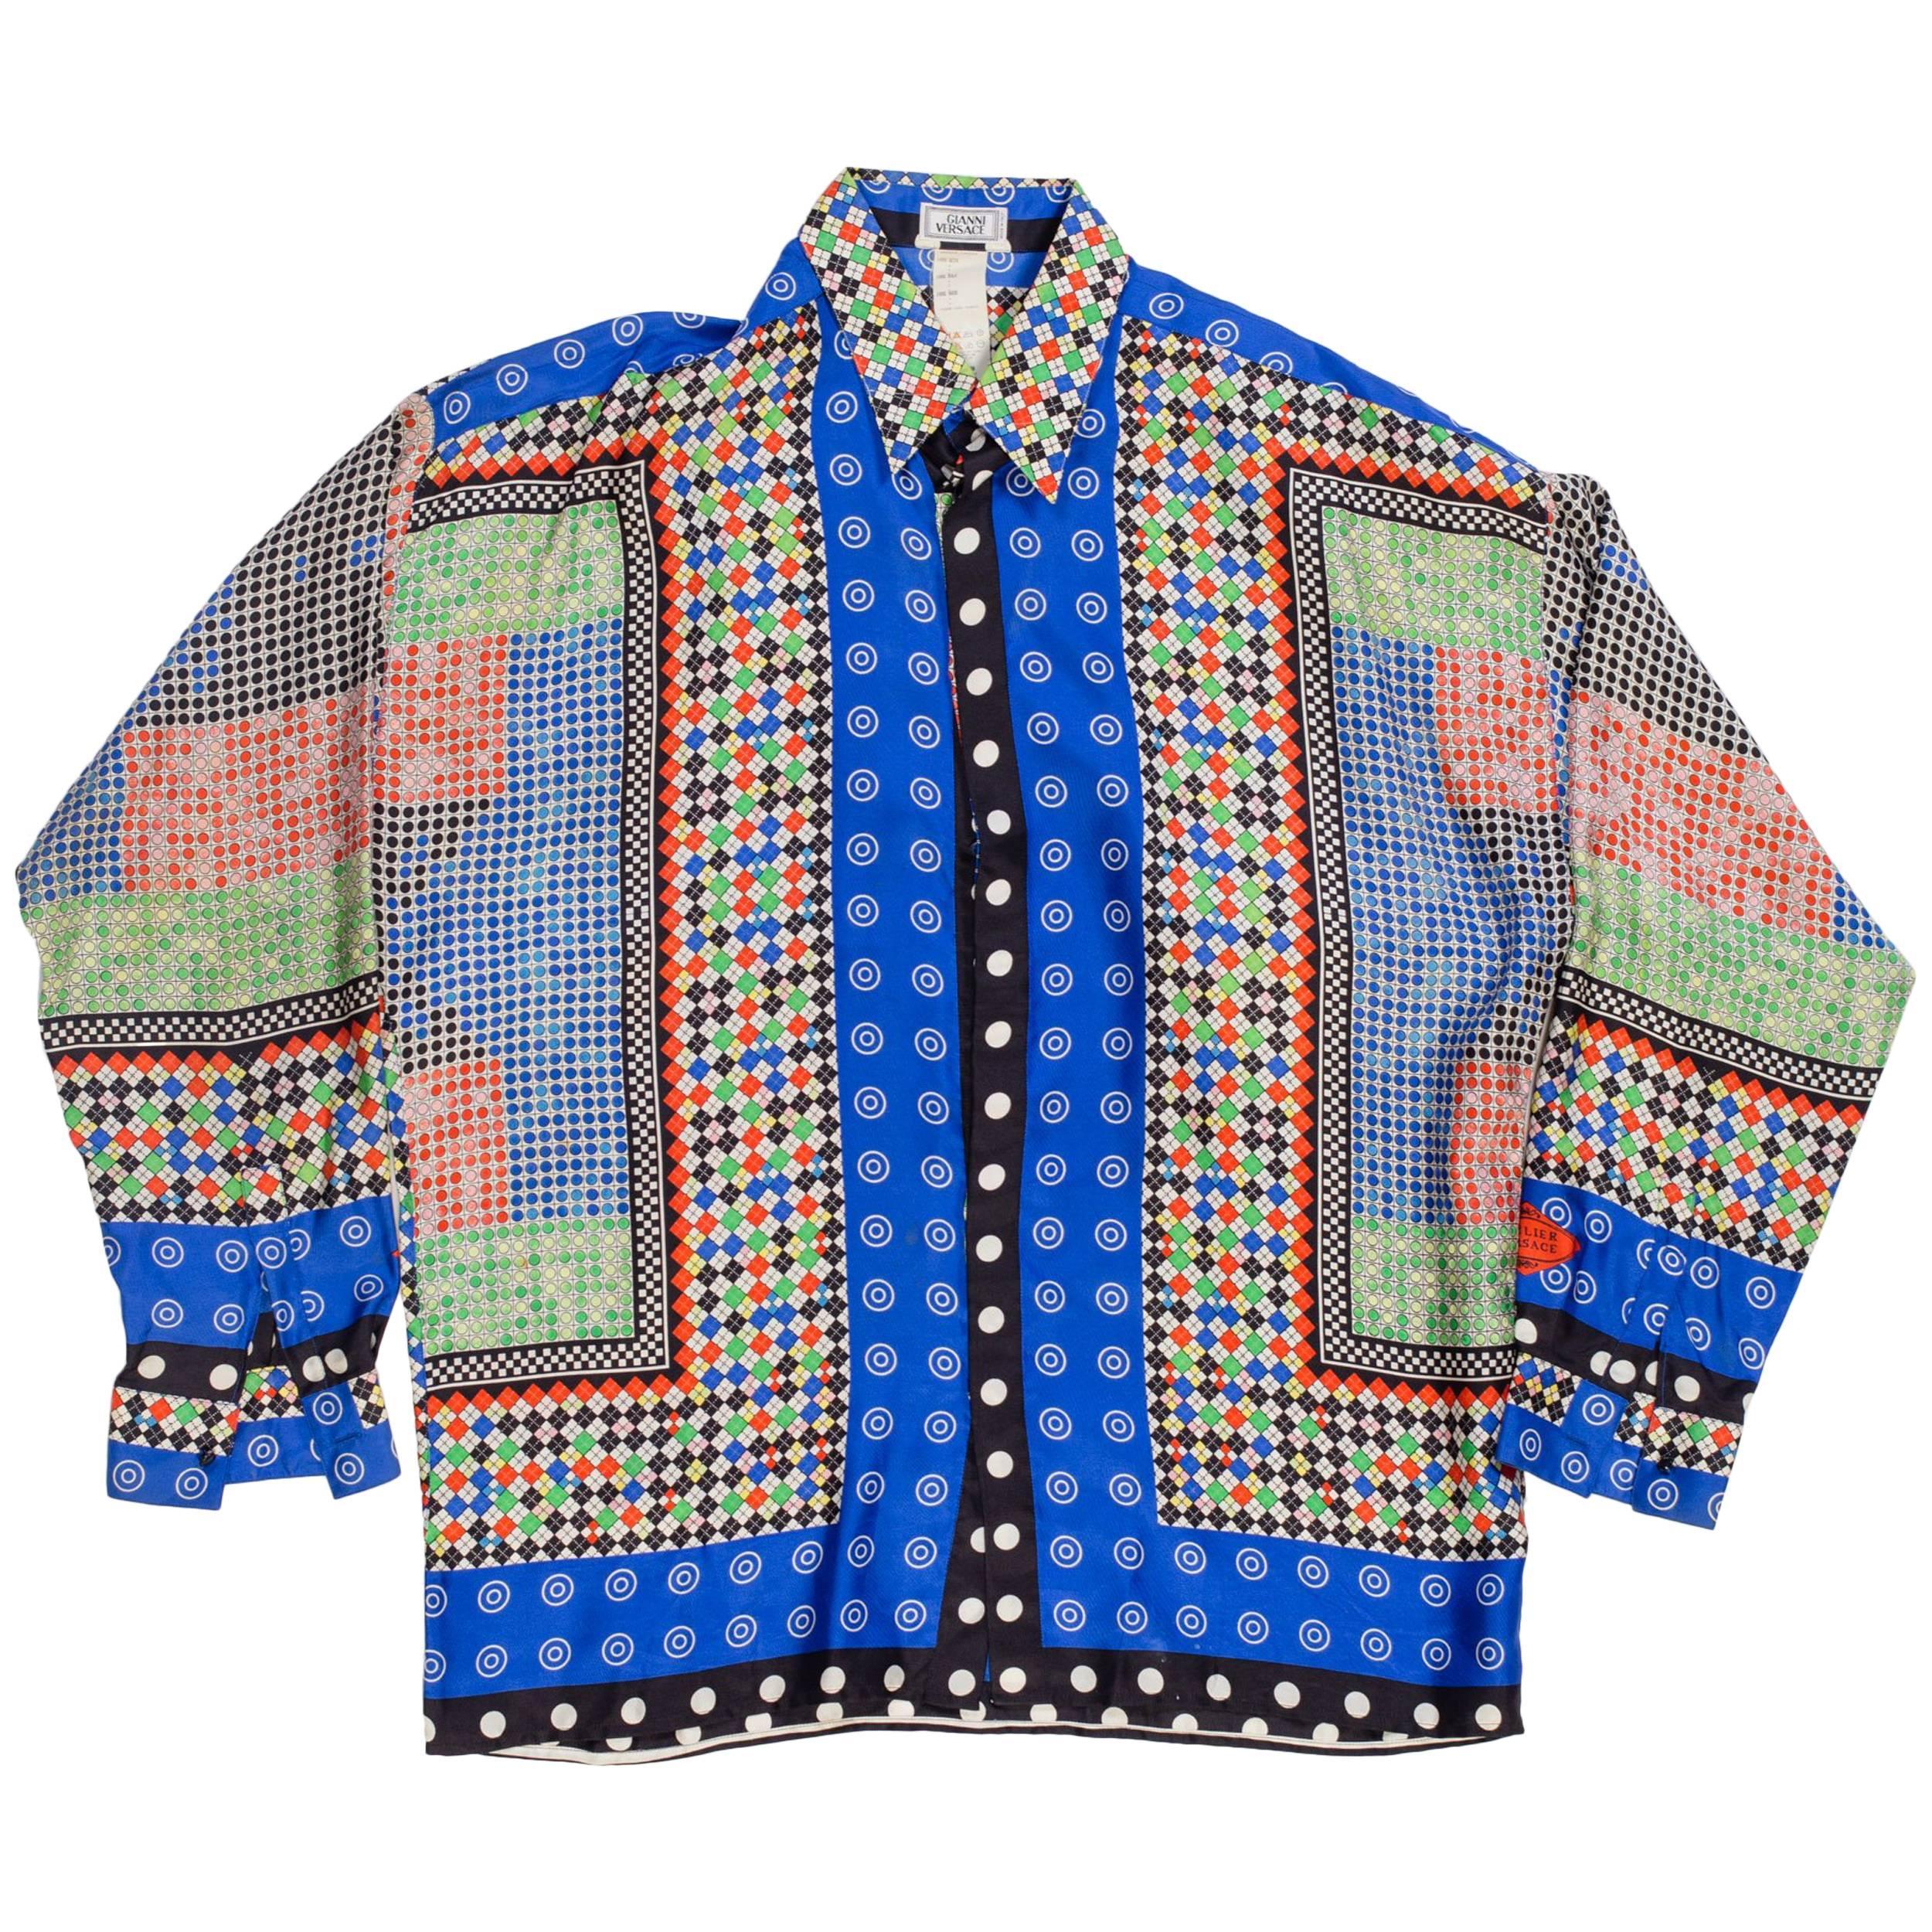 1990S GIANNI VERSACE Multicolor Geometric Silk Men's Shirt Sz 52